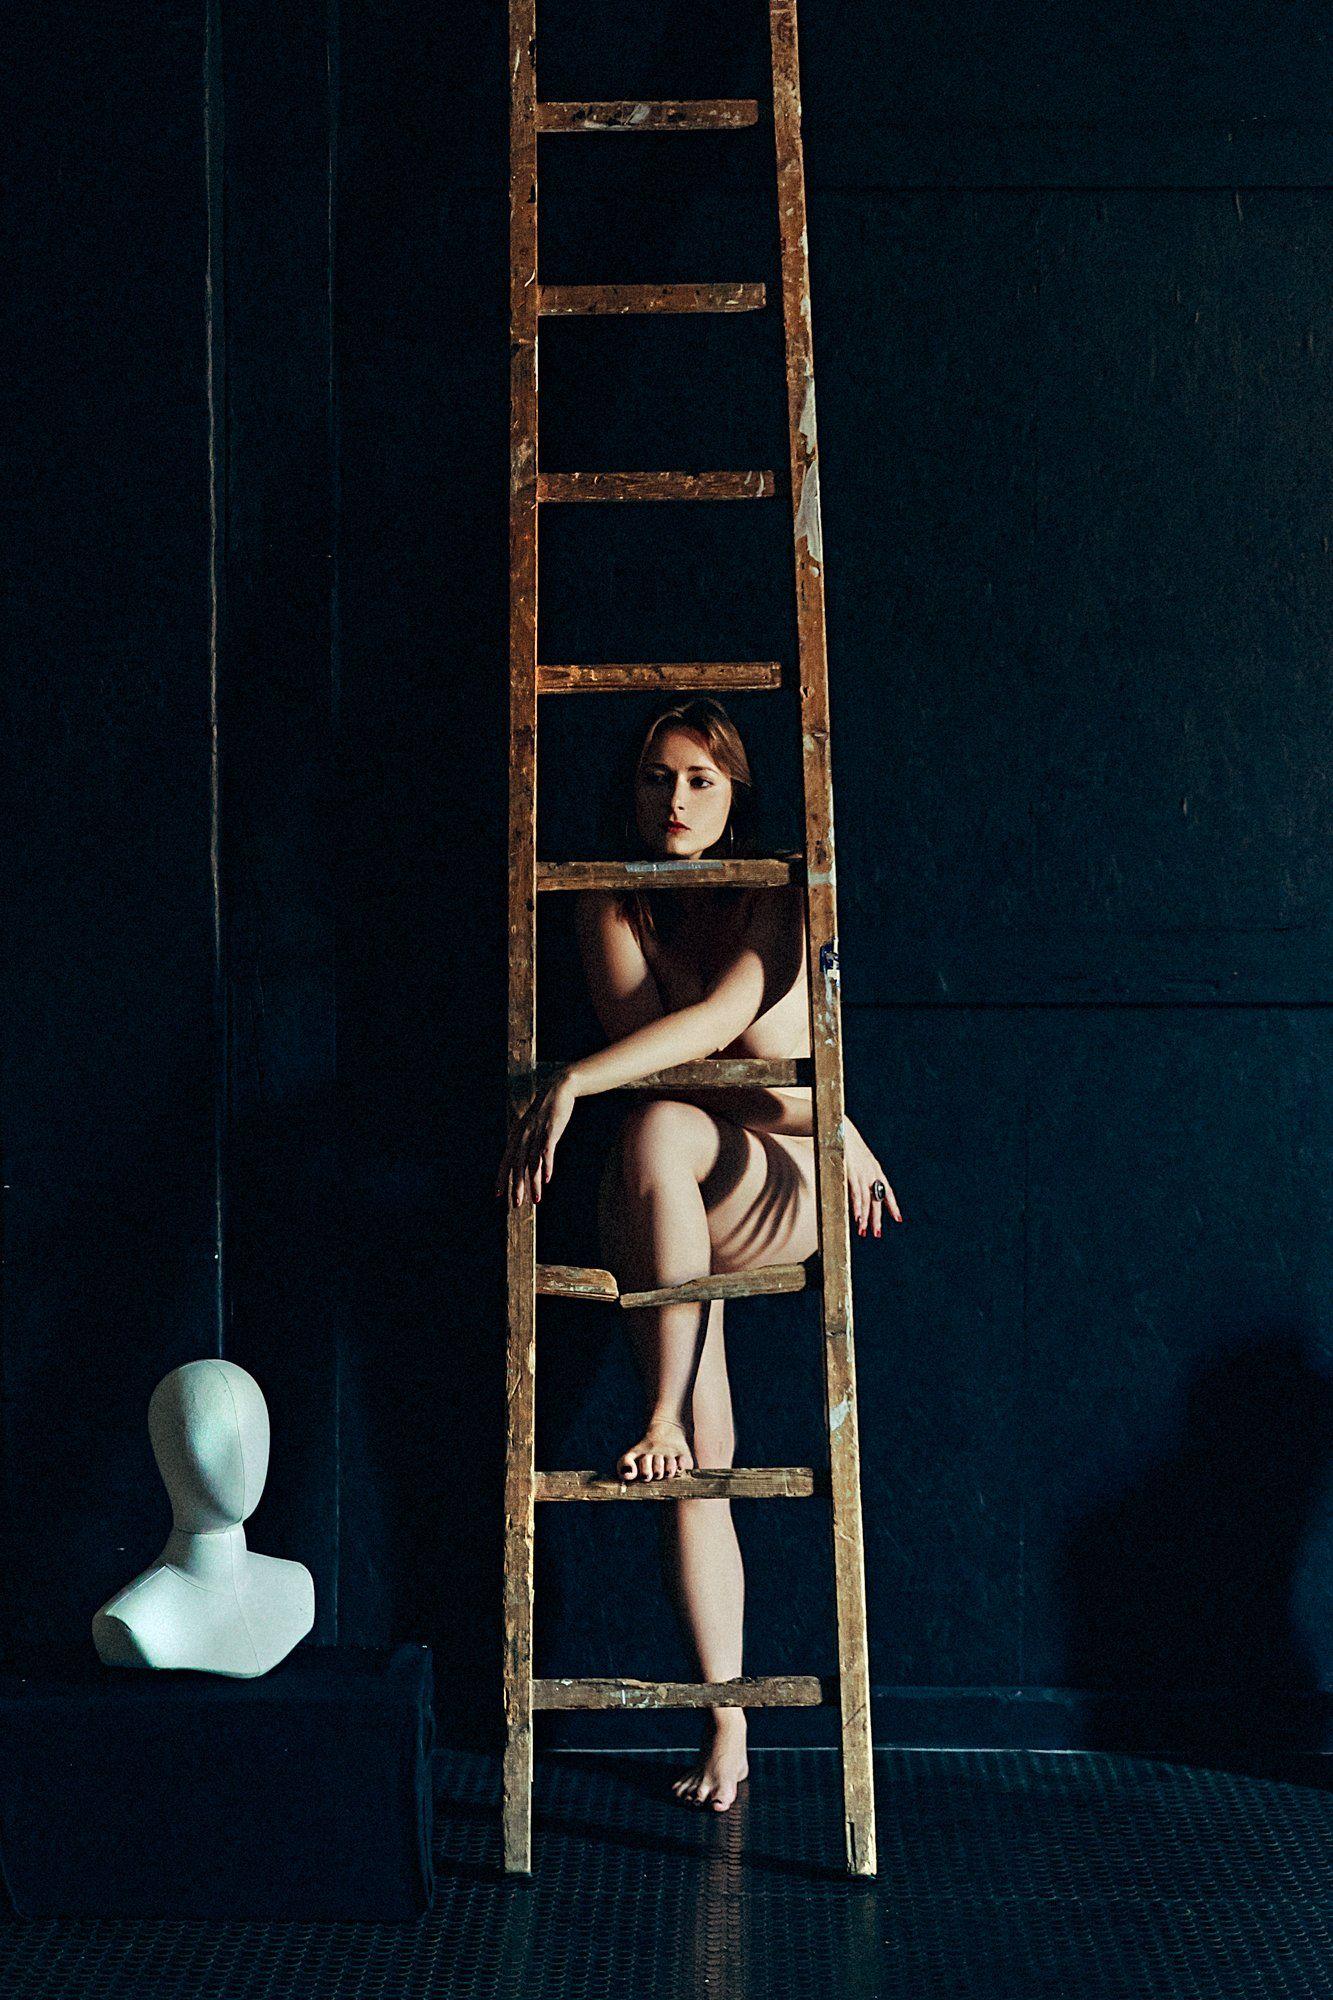 woman, indoors, art, light, Руслан Болгов (Axe)